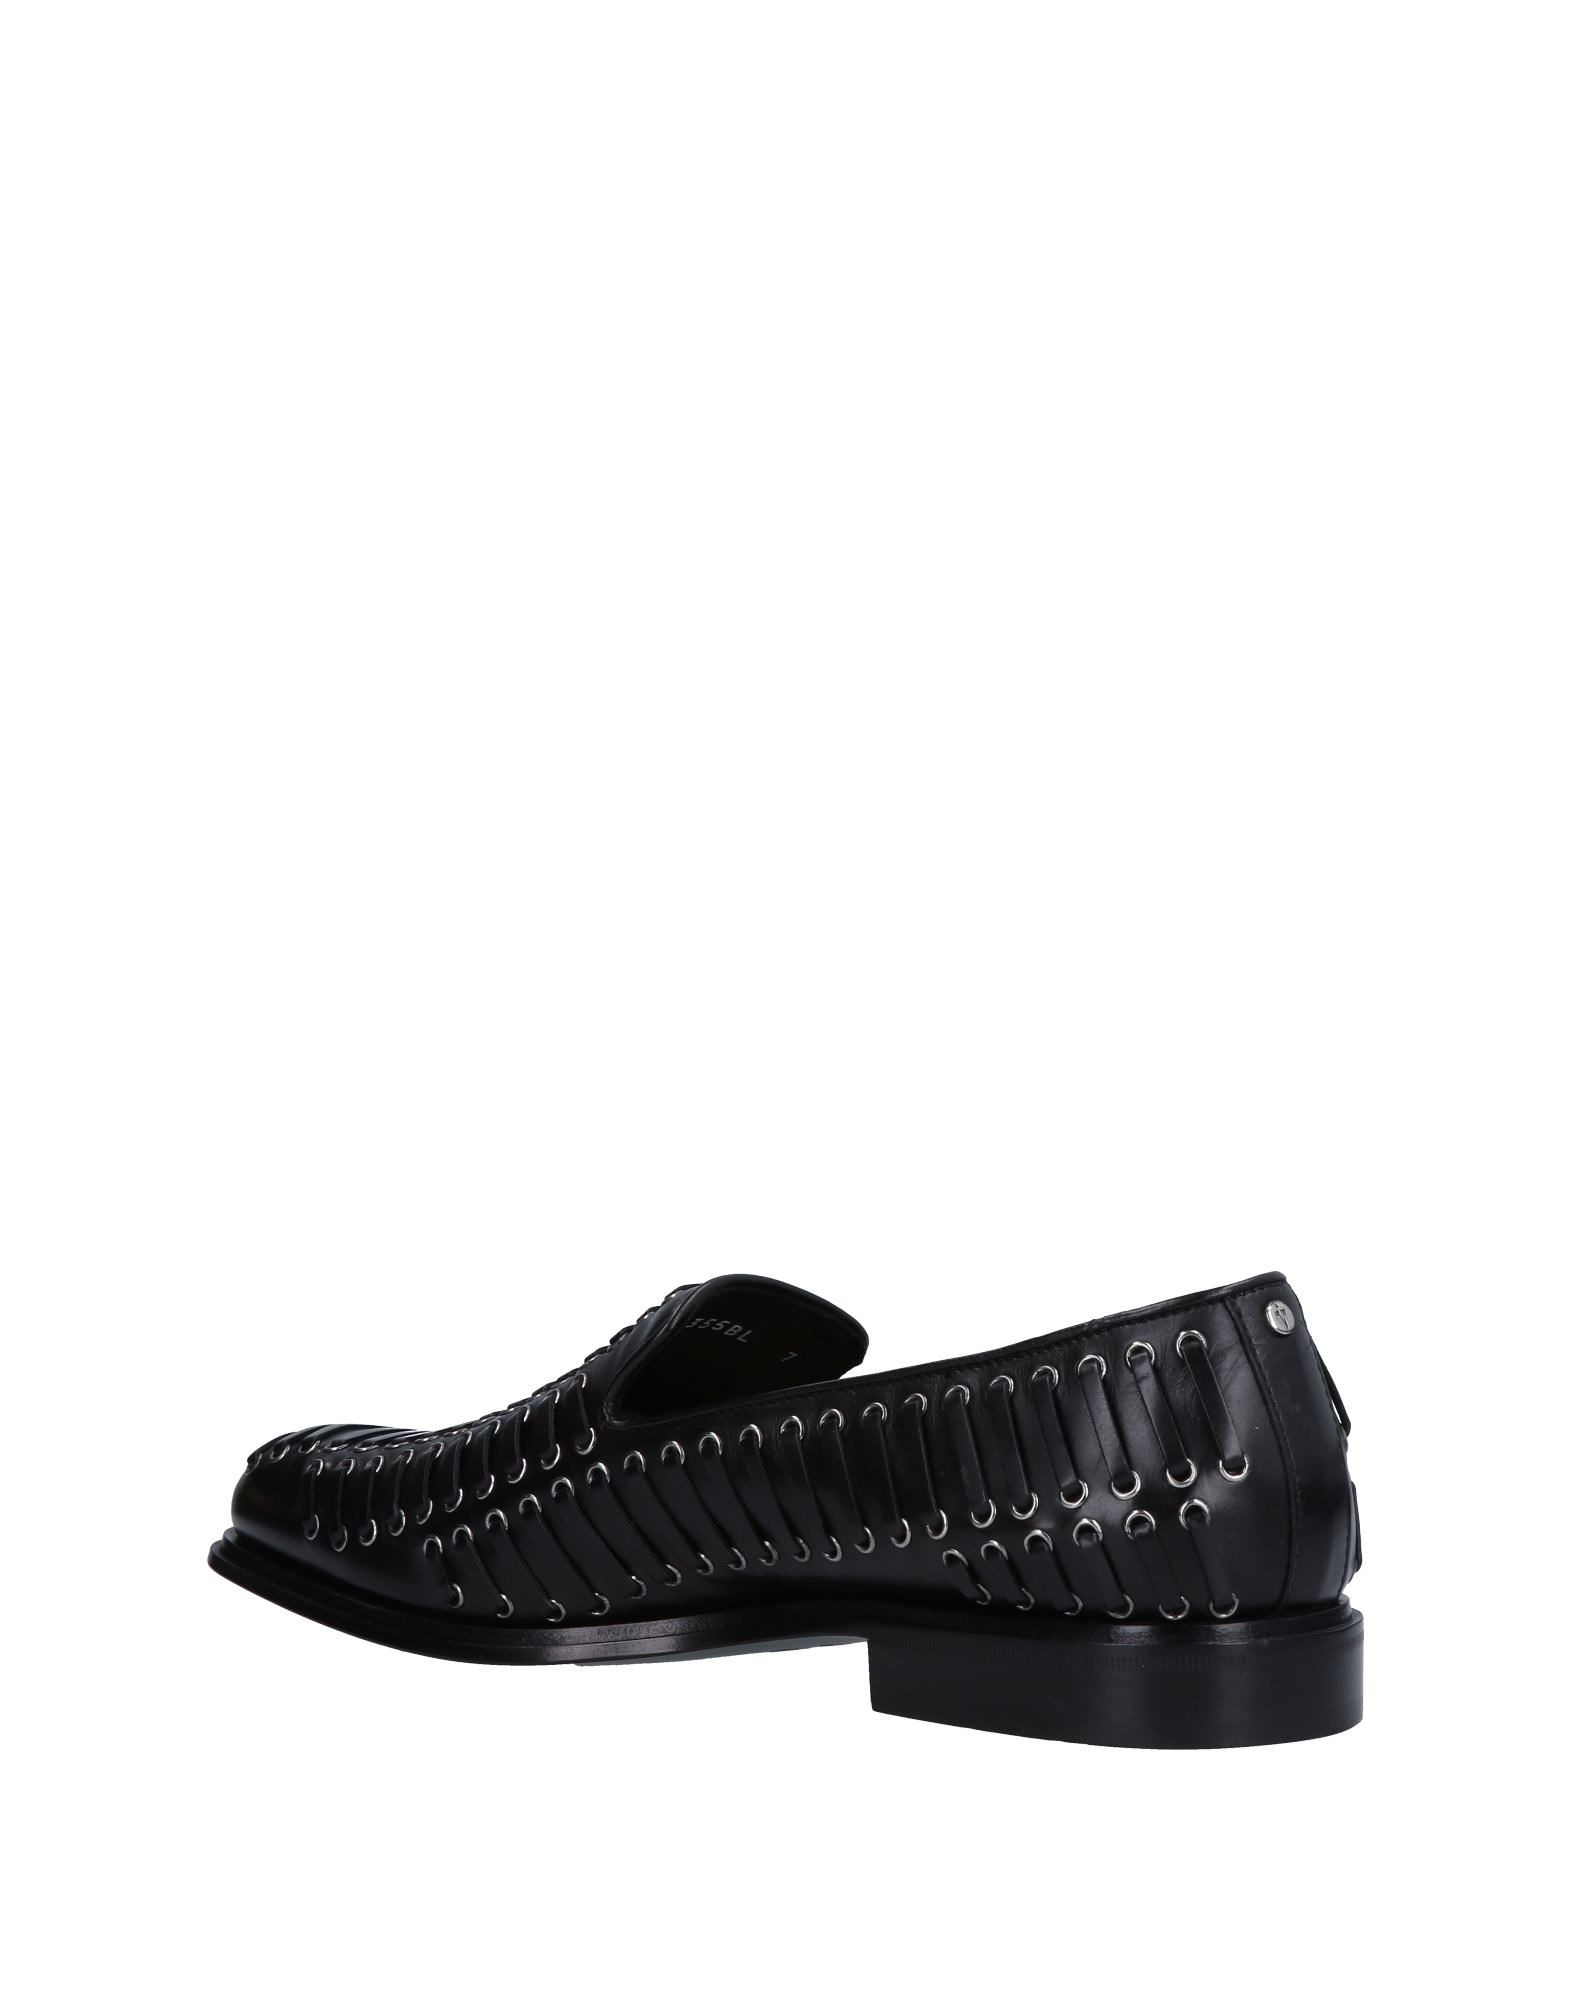 Cesare Paciotti Gute Mokassins Herren  11504992JO Gute Paciotti Qualität beliebte Schuhe 18f338